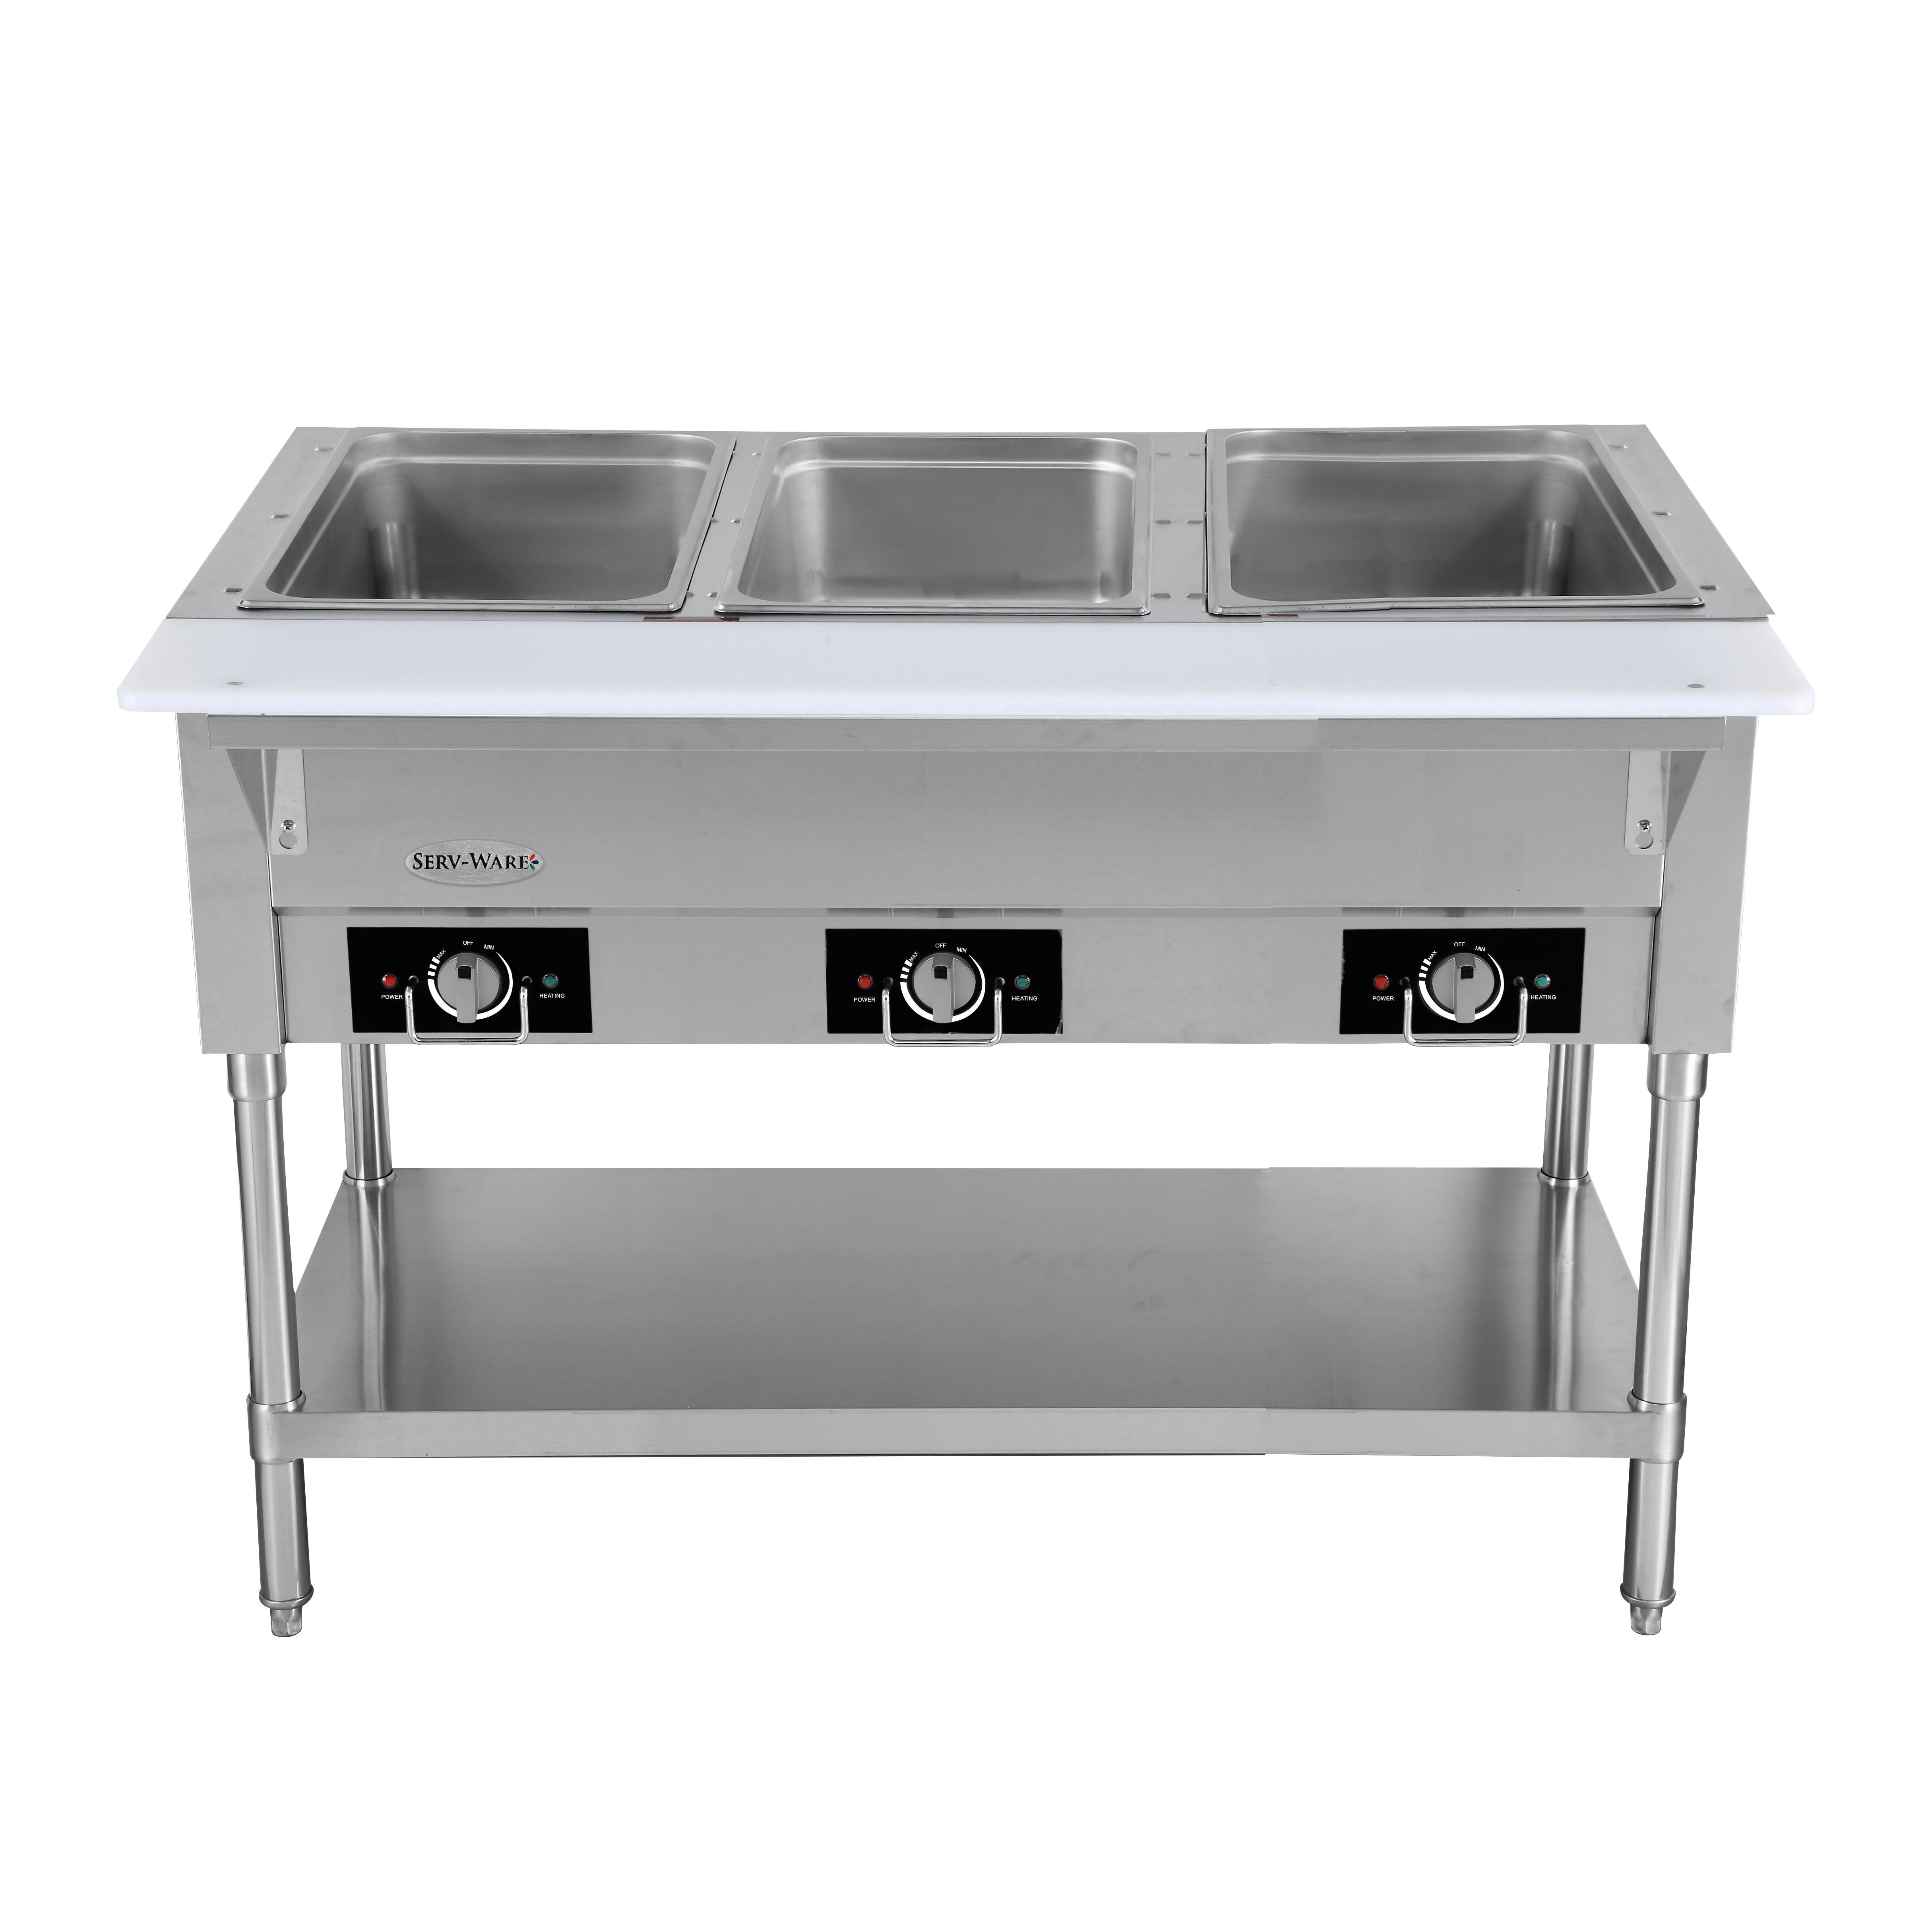 Serv-Ware EST3-1 serving counter, hot food, electric